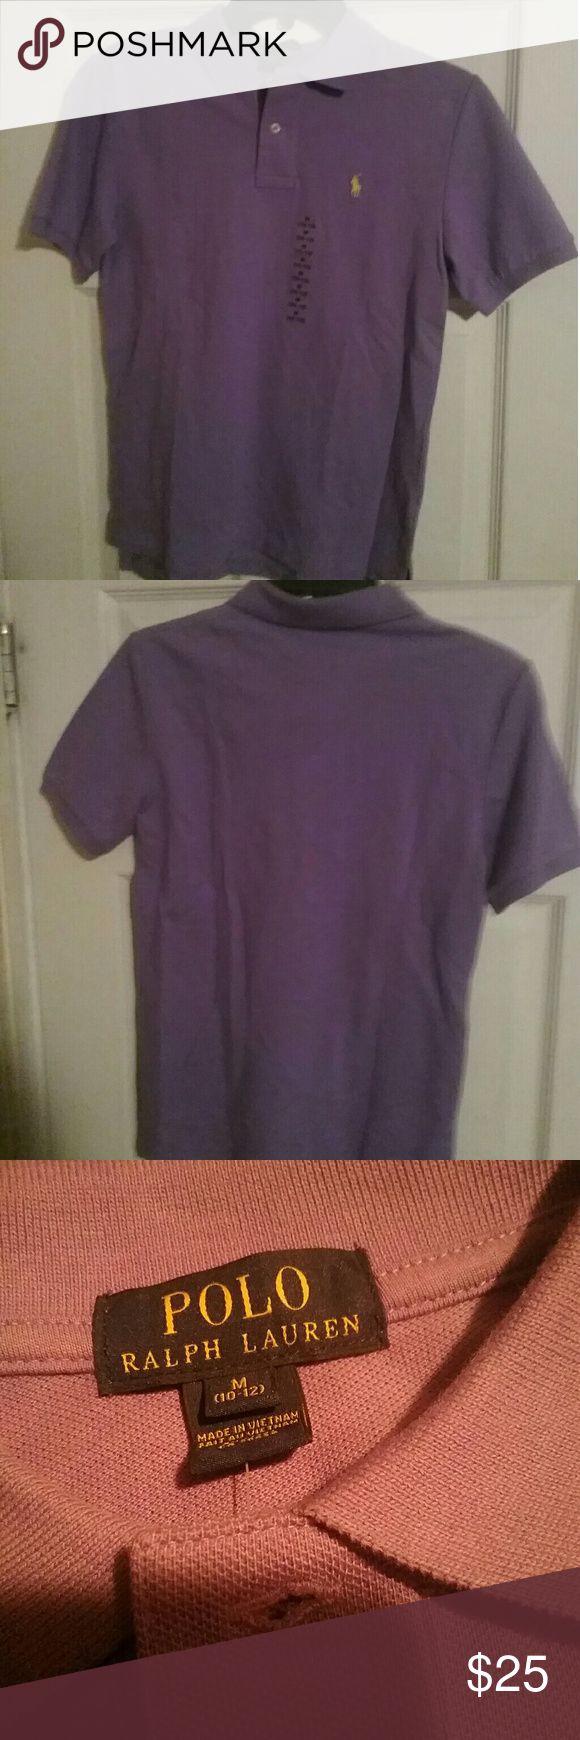 POLO RALPH LAUREN POLO SHIRT YOUTH M 10-12 Light Purple Polo Shirt  Short Sleeve Brand New Never Worn Polo by Ralph Lauren Shirts & Tops Polos